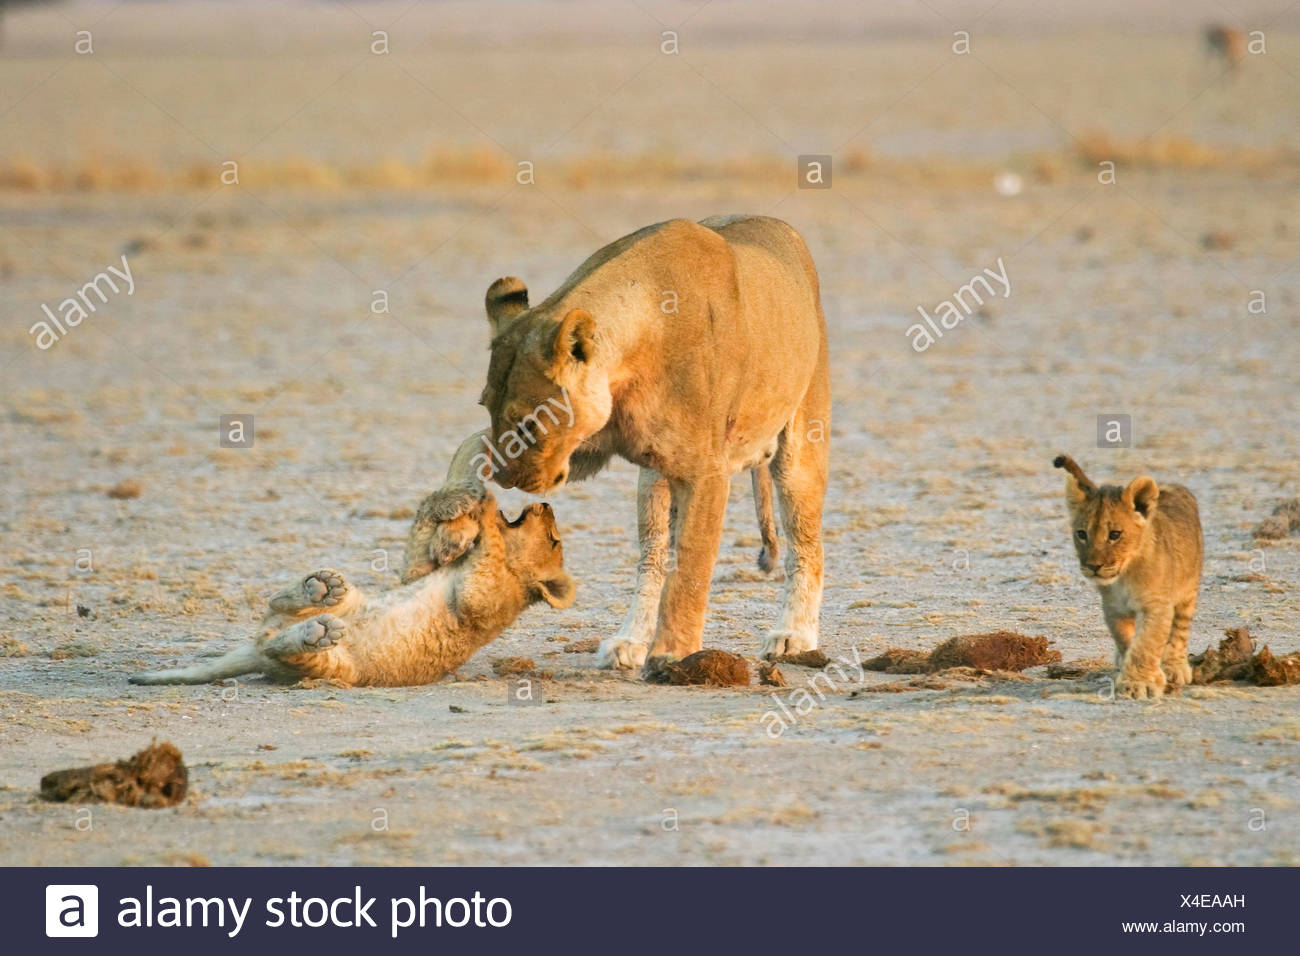 Lioness (Panthera leo) is playing with her cups, Nxai Pan, Makgadikgadi Pans National Park, Botswana, Africa Stock Photo